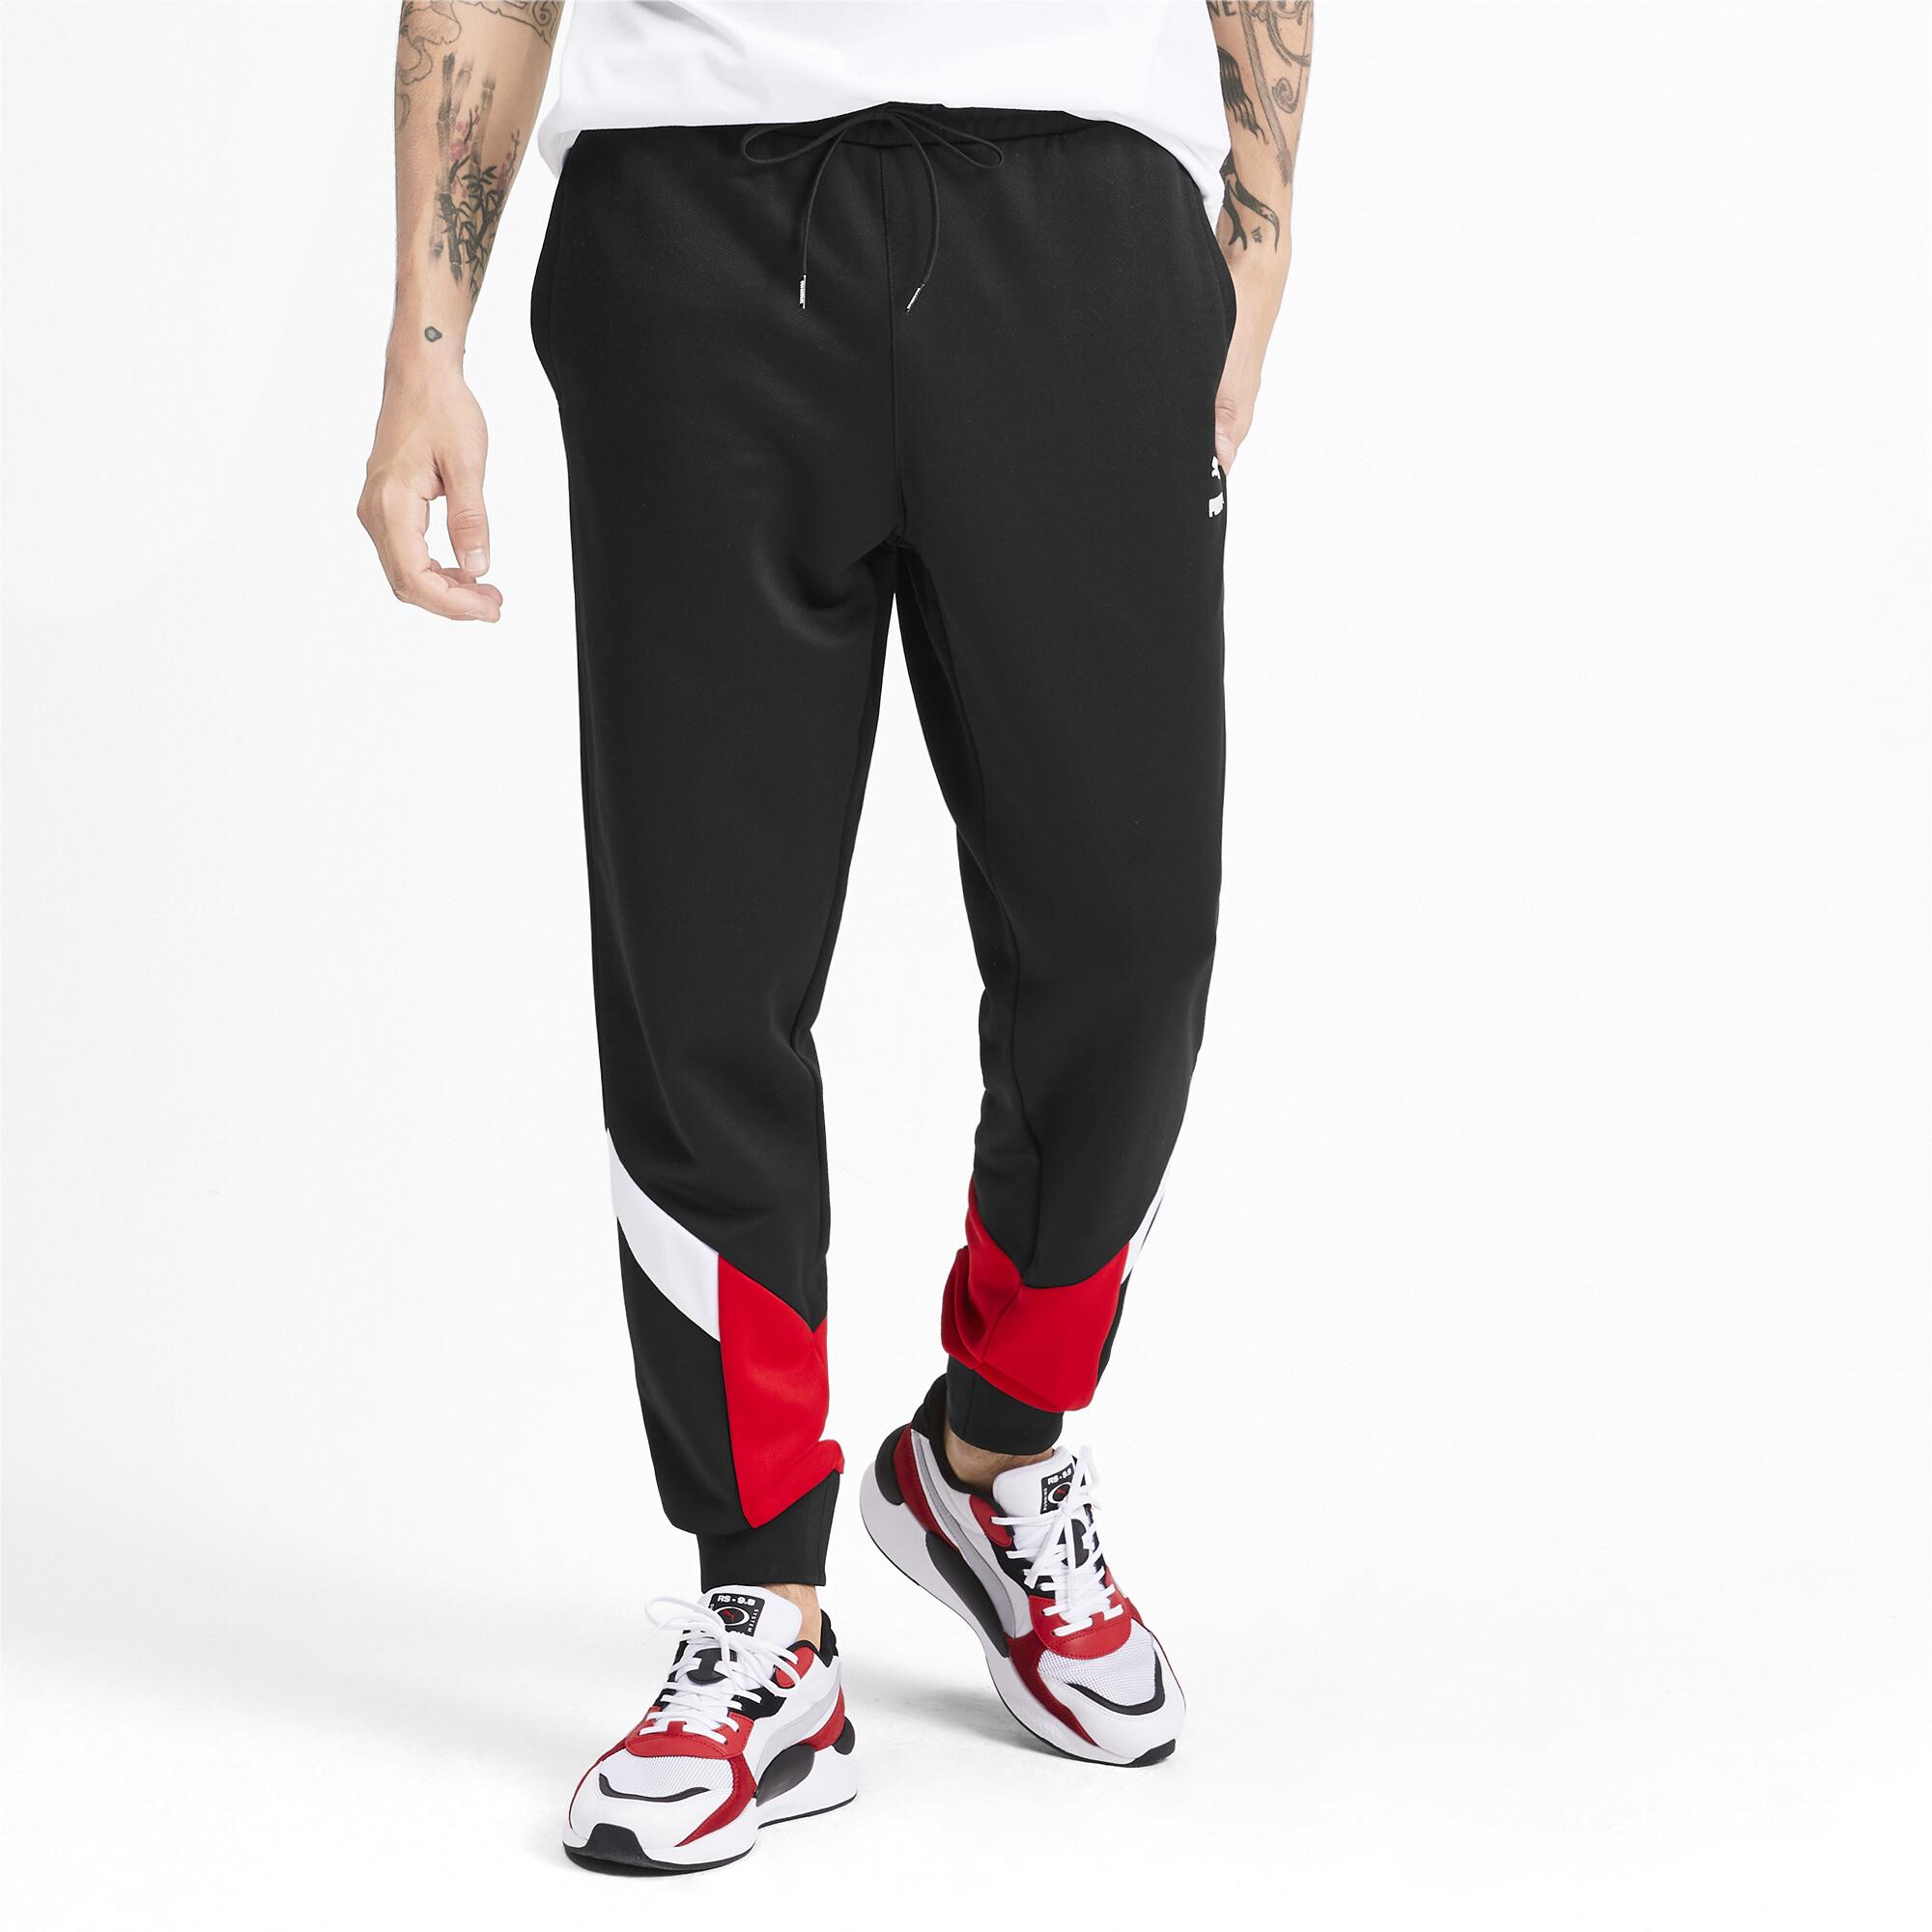 PUMA-Iconic-MCS-Men-039-s-Track-Pants-Men-Knitted-Pants-Sport-Classics thumbnail 4